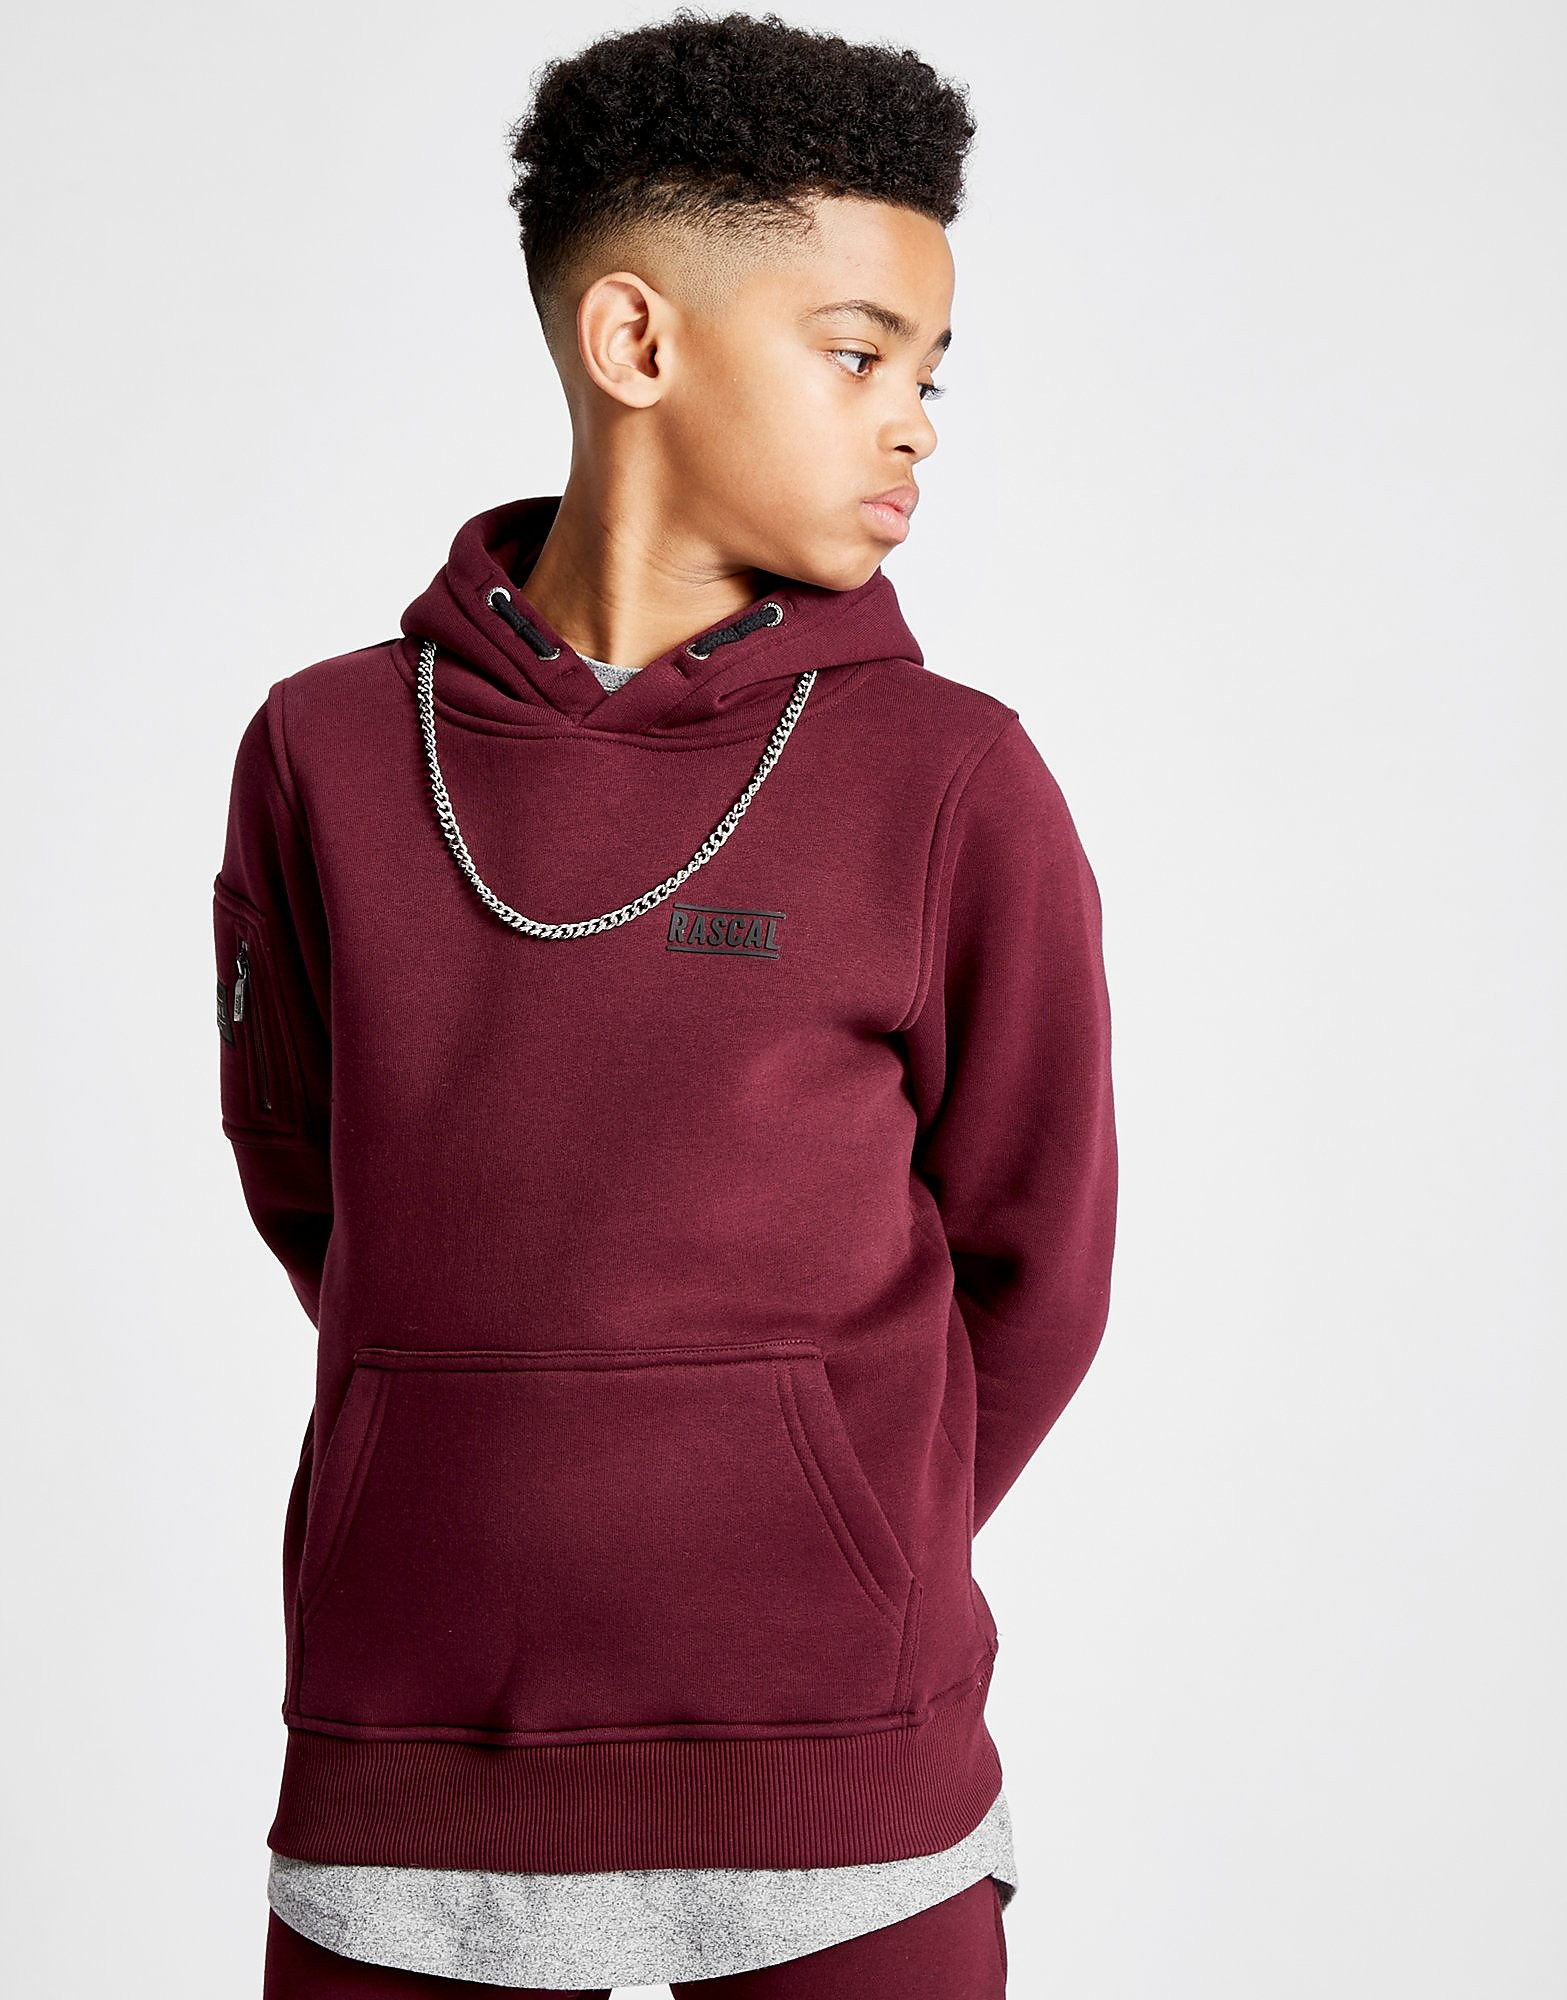 Rascal Essential Fleece Overhead Hoodie Junior